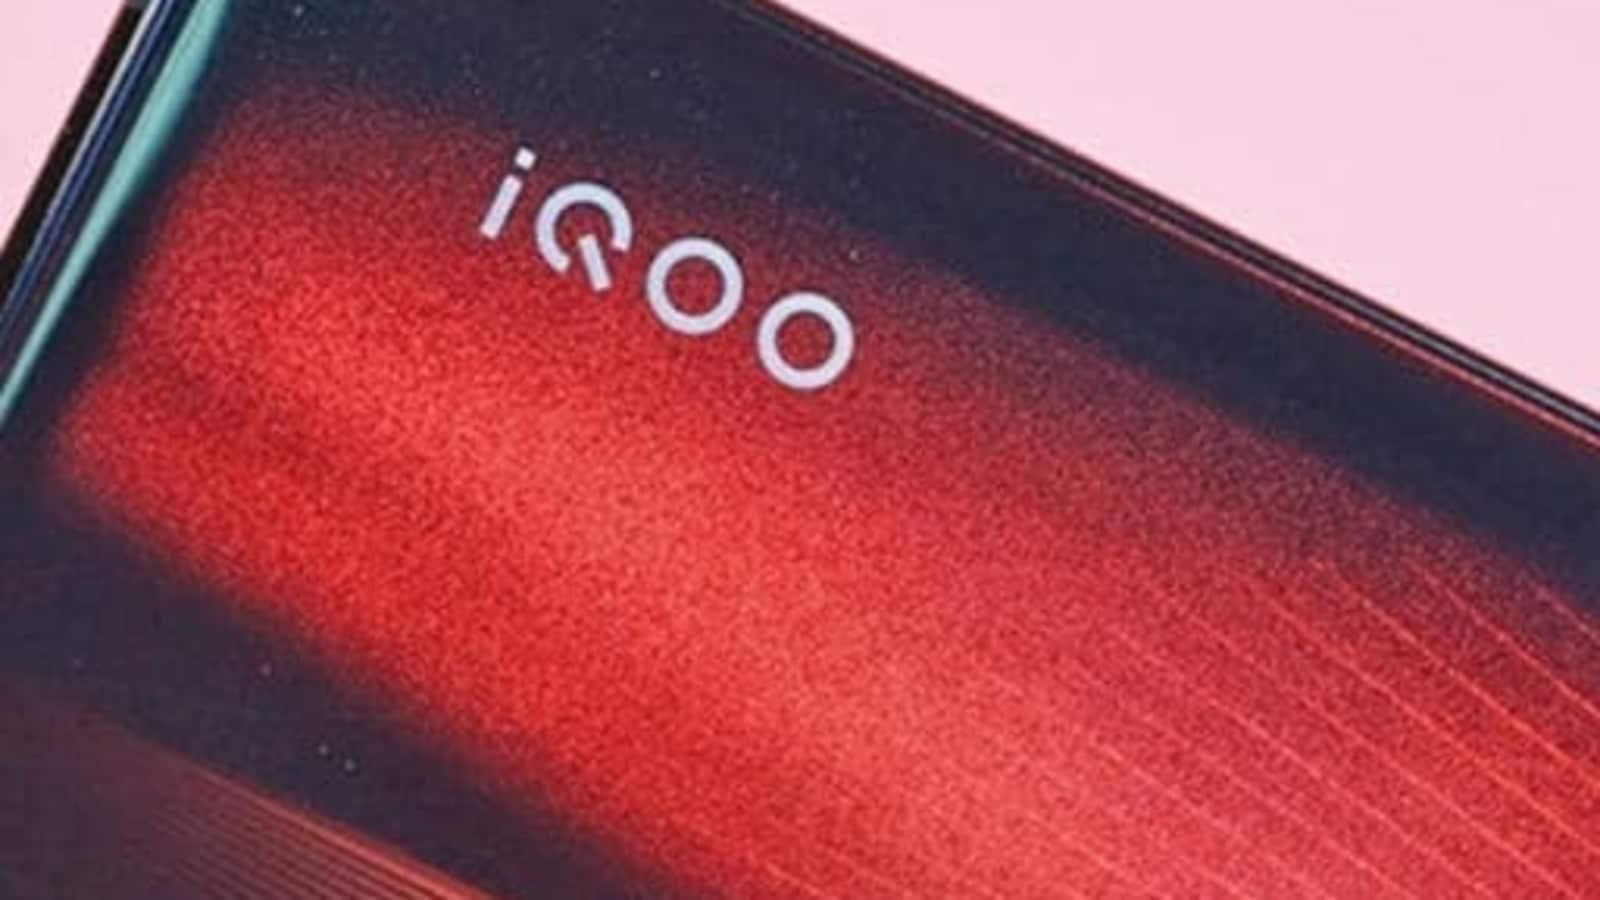 iQoo U3x Standard Edition MediaTek Helio G80 SoC: Price, specifications and more